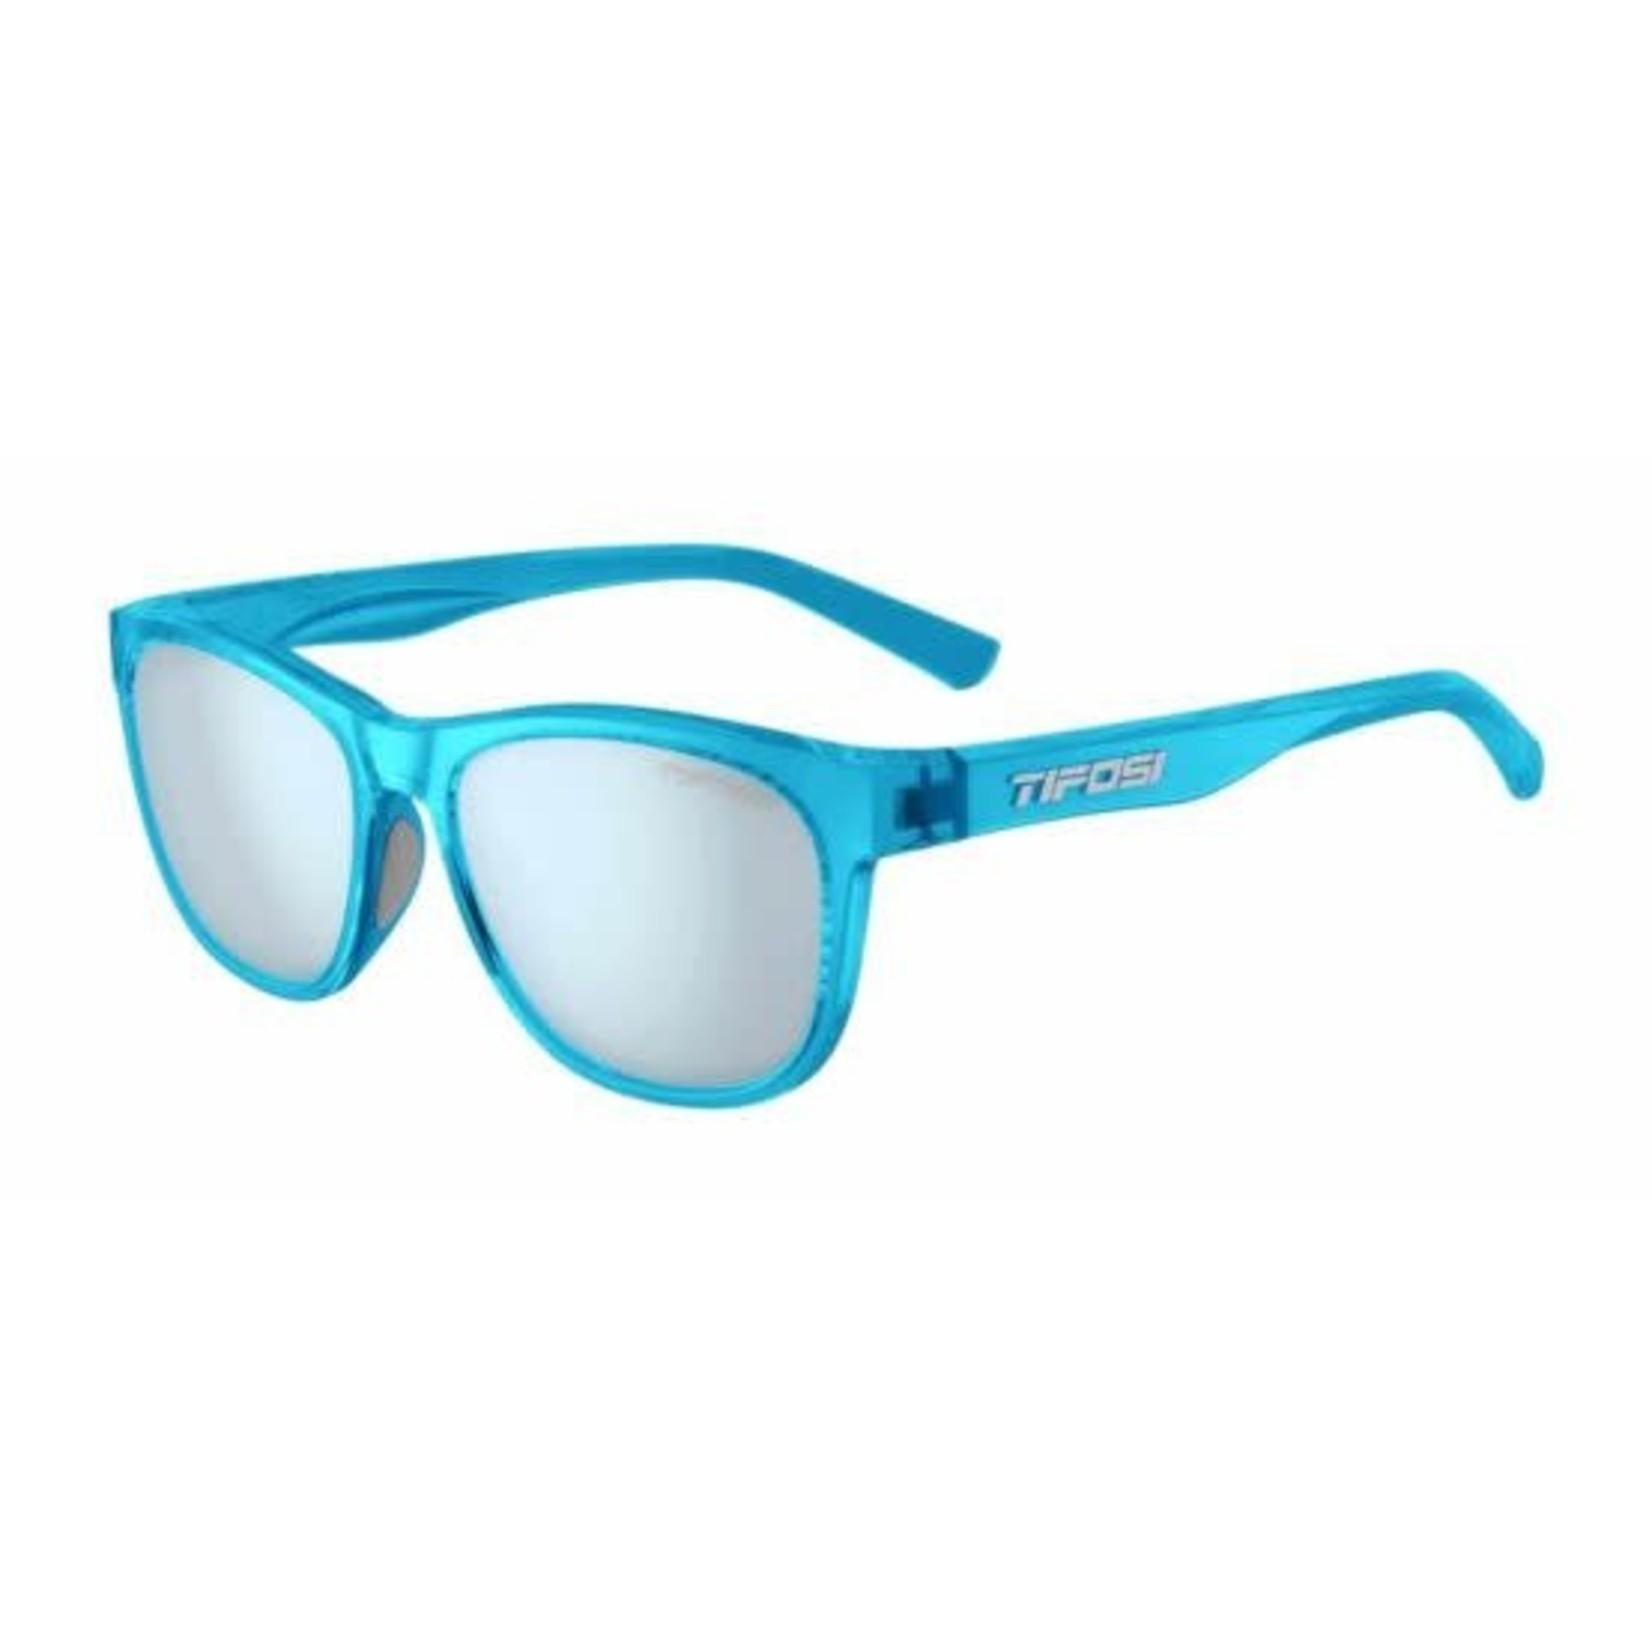 Tifosi Optics Swank, Crystal Sky Blue Single Lens Sunglasses